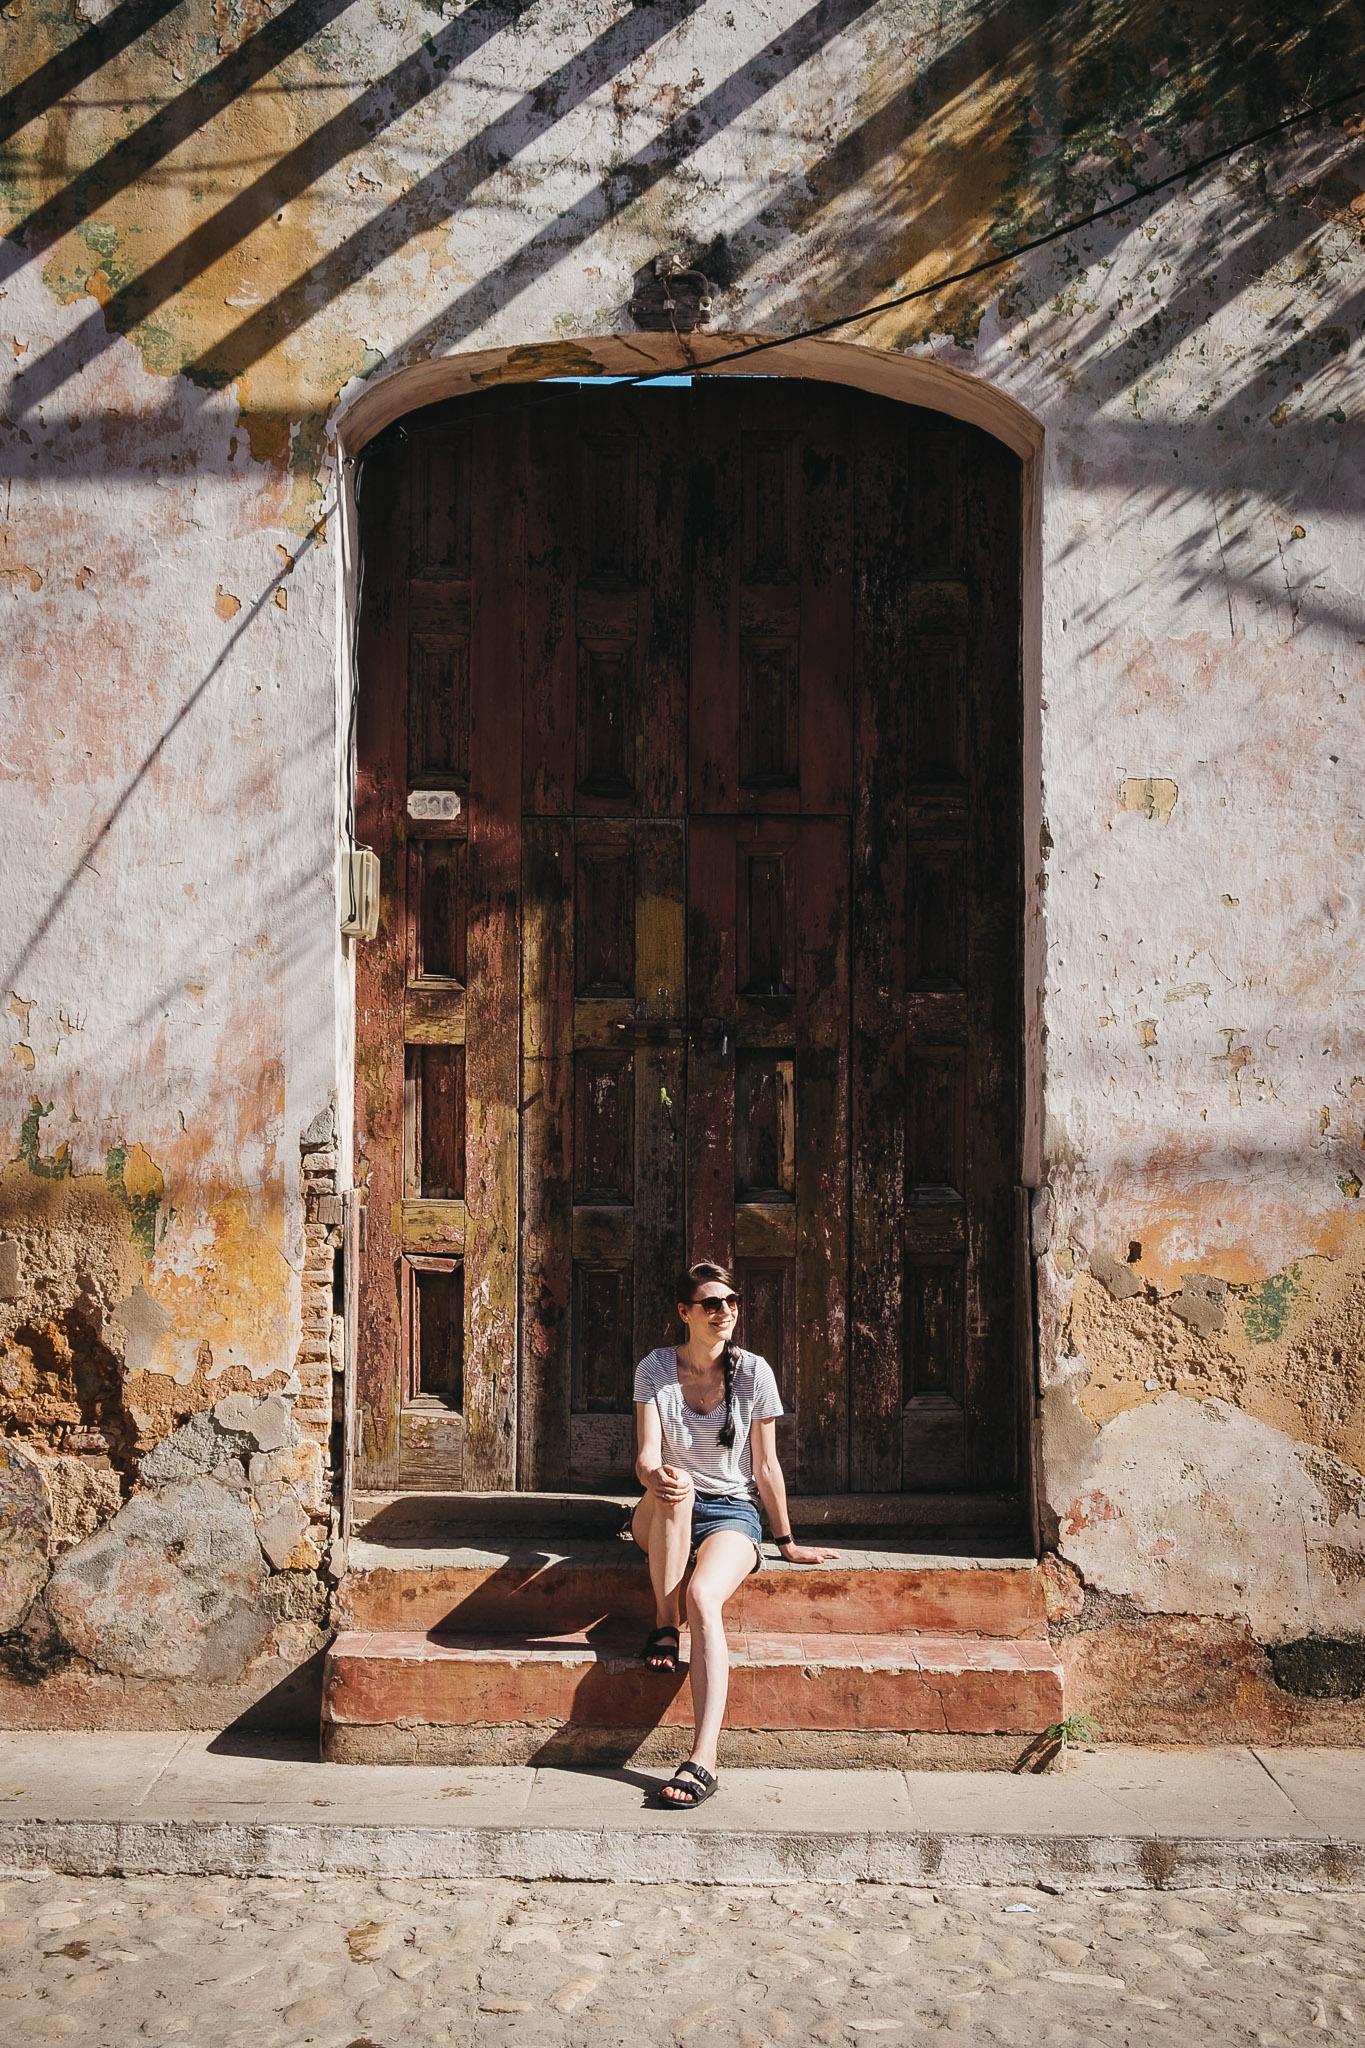 Cuba-2017-12-Trinidad-0308.jpg